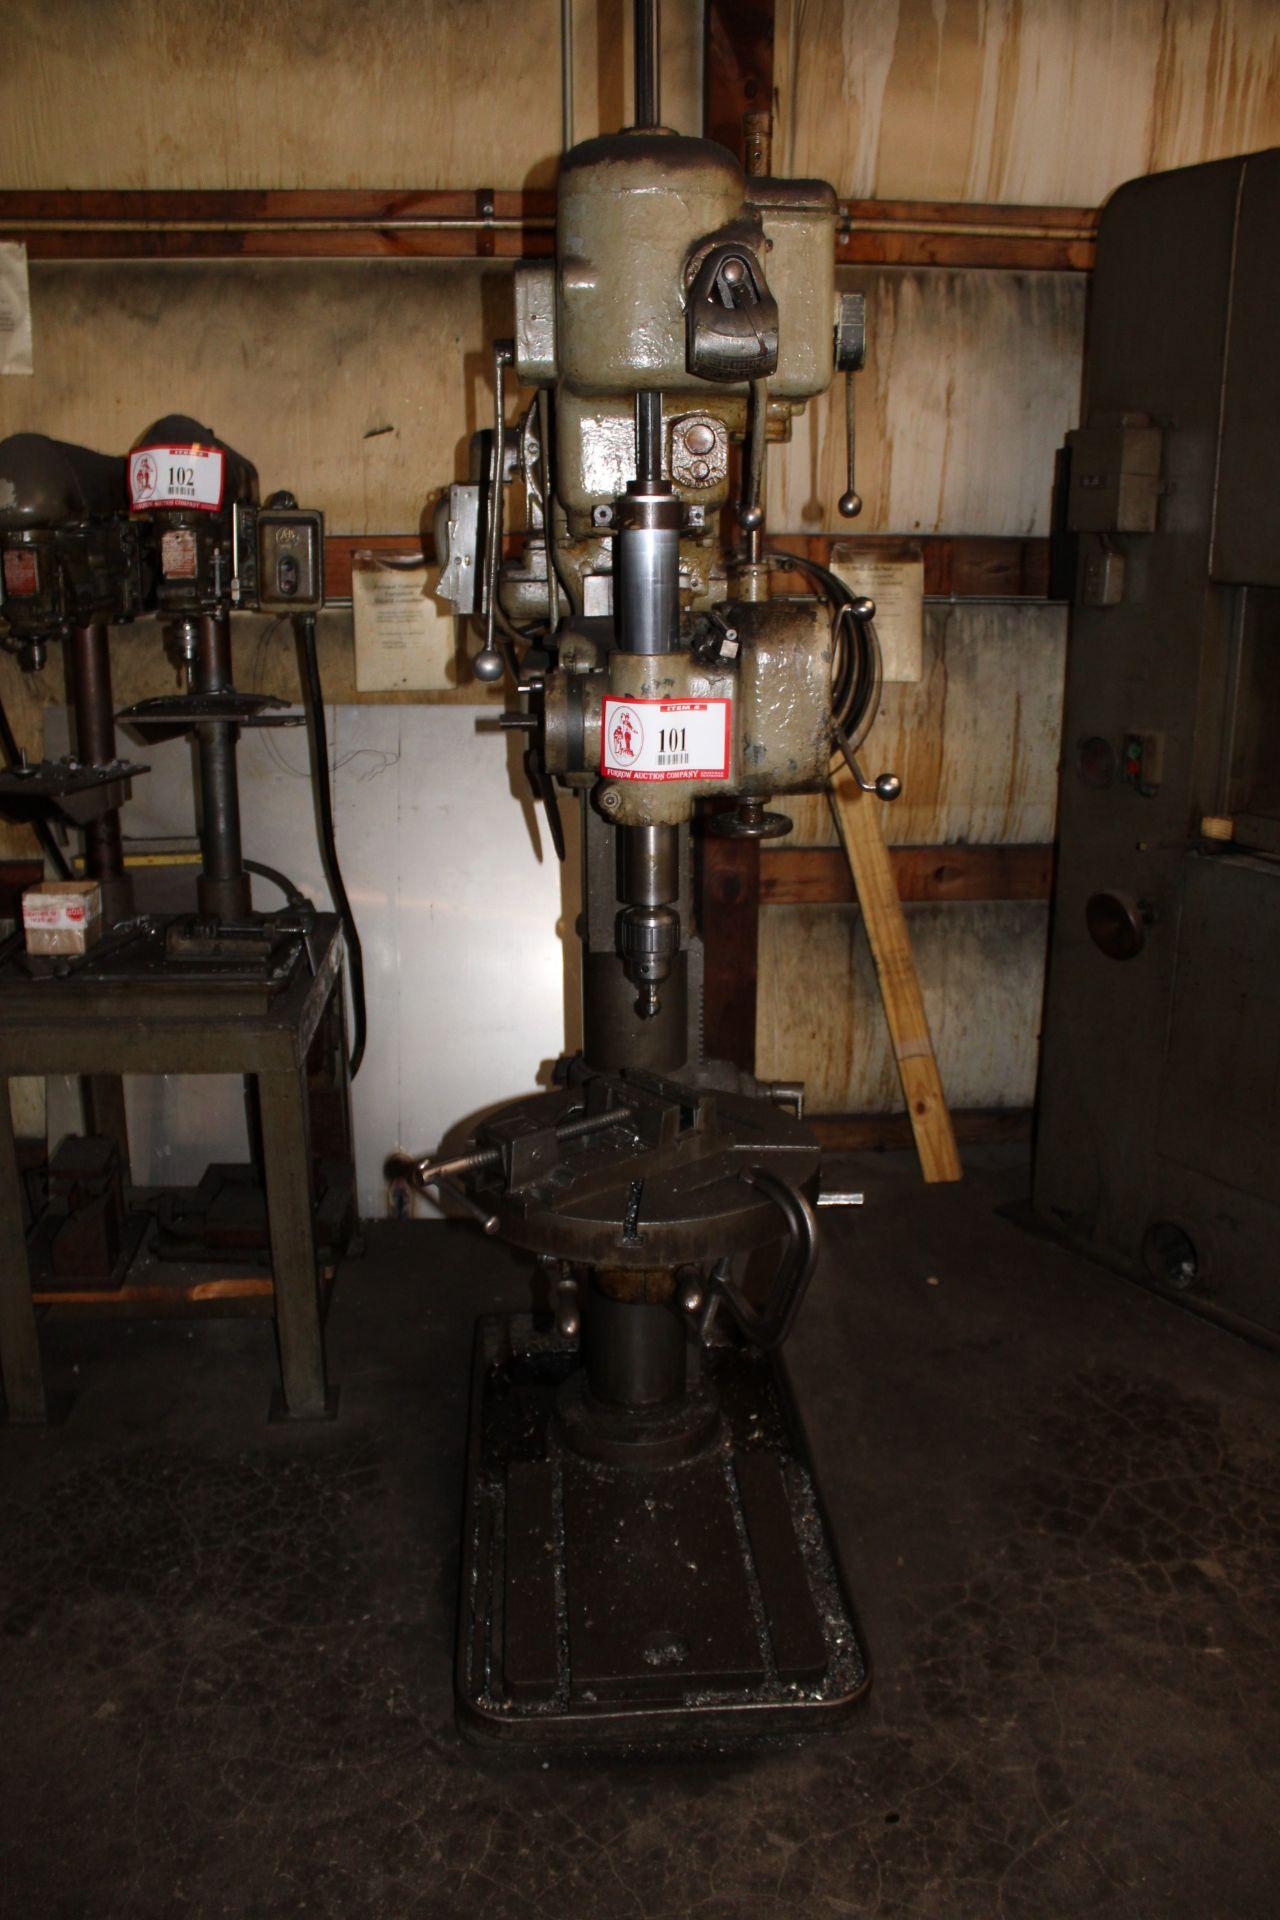 Lot 101 - Cincinnati Bickford Super Service Vertical Drill Press